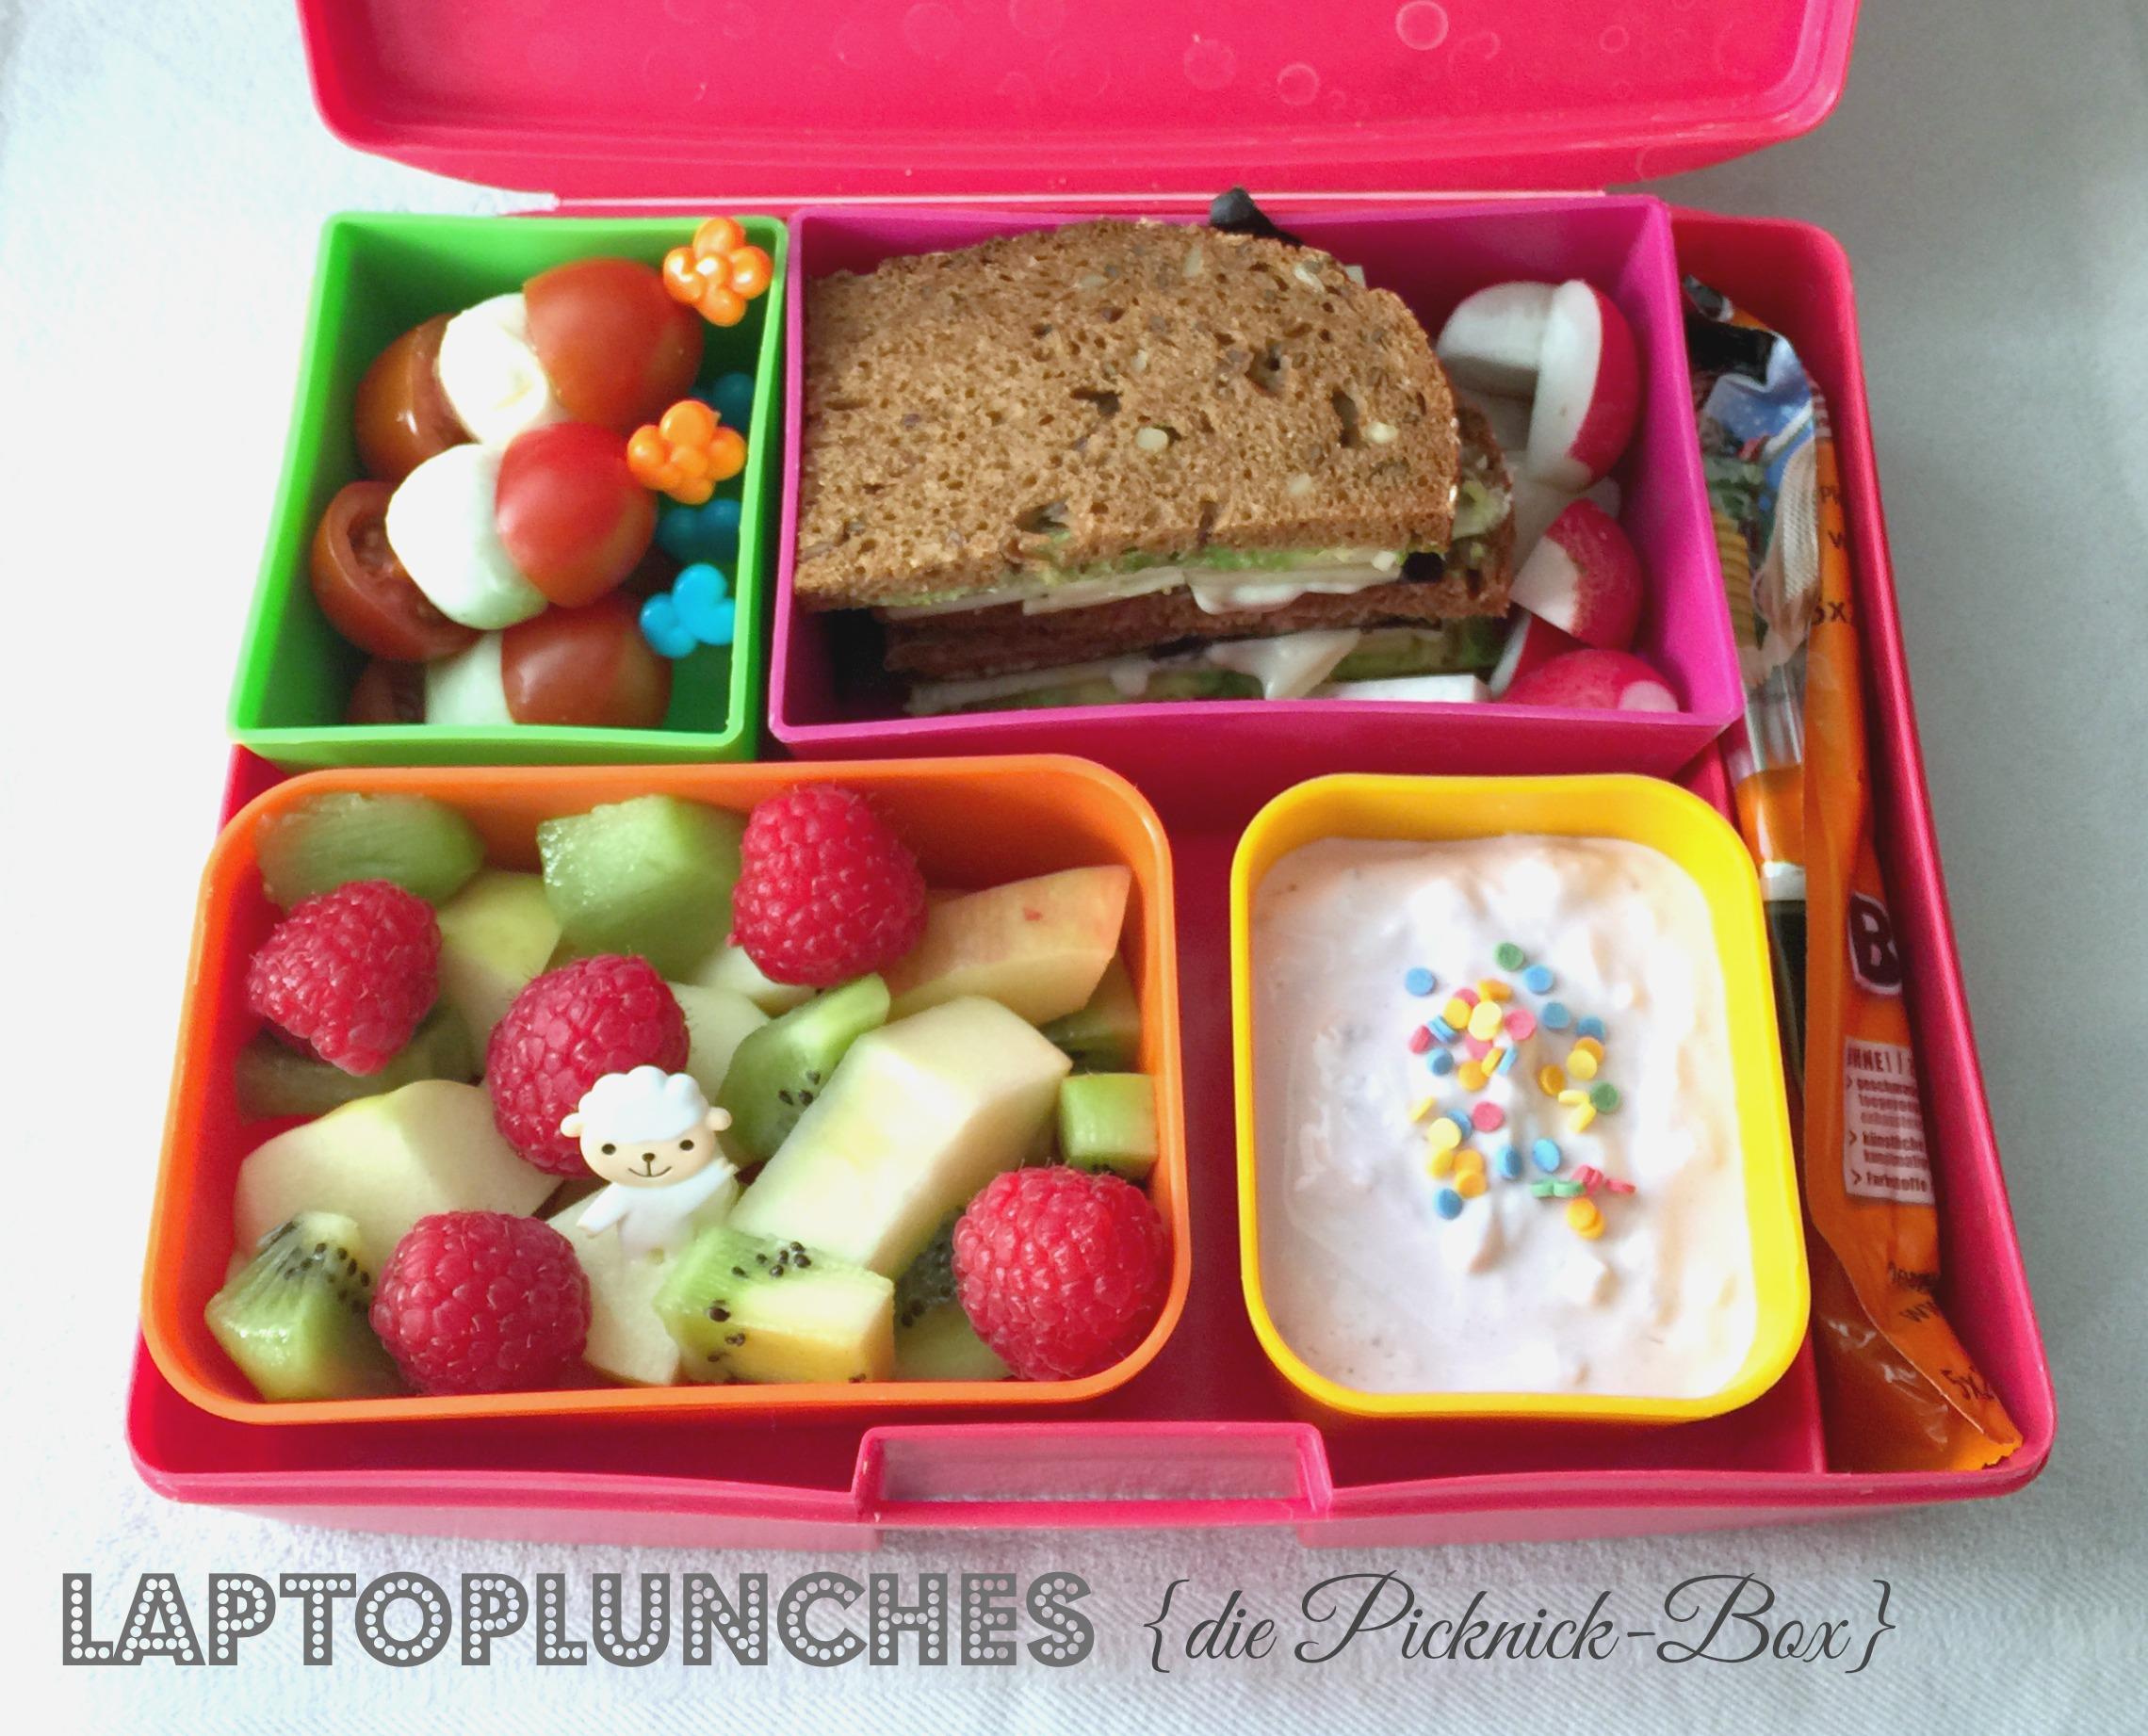 Laptoplunches, Bentobox, Lunchboxinspiration, Lunchboxdiary, Picknick